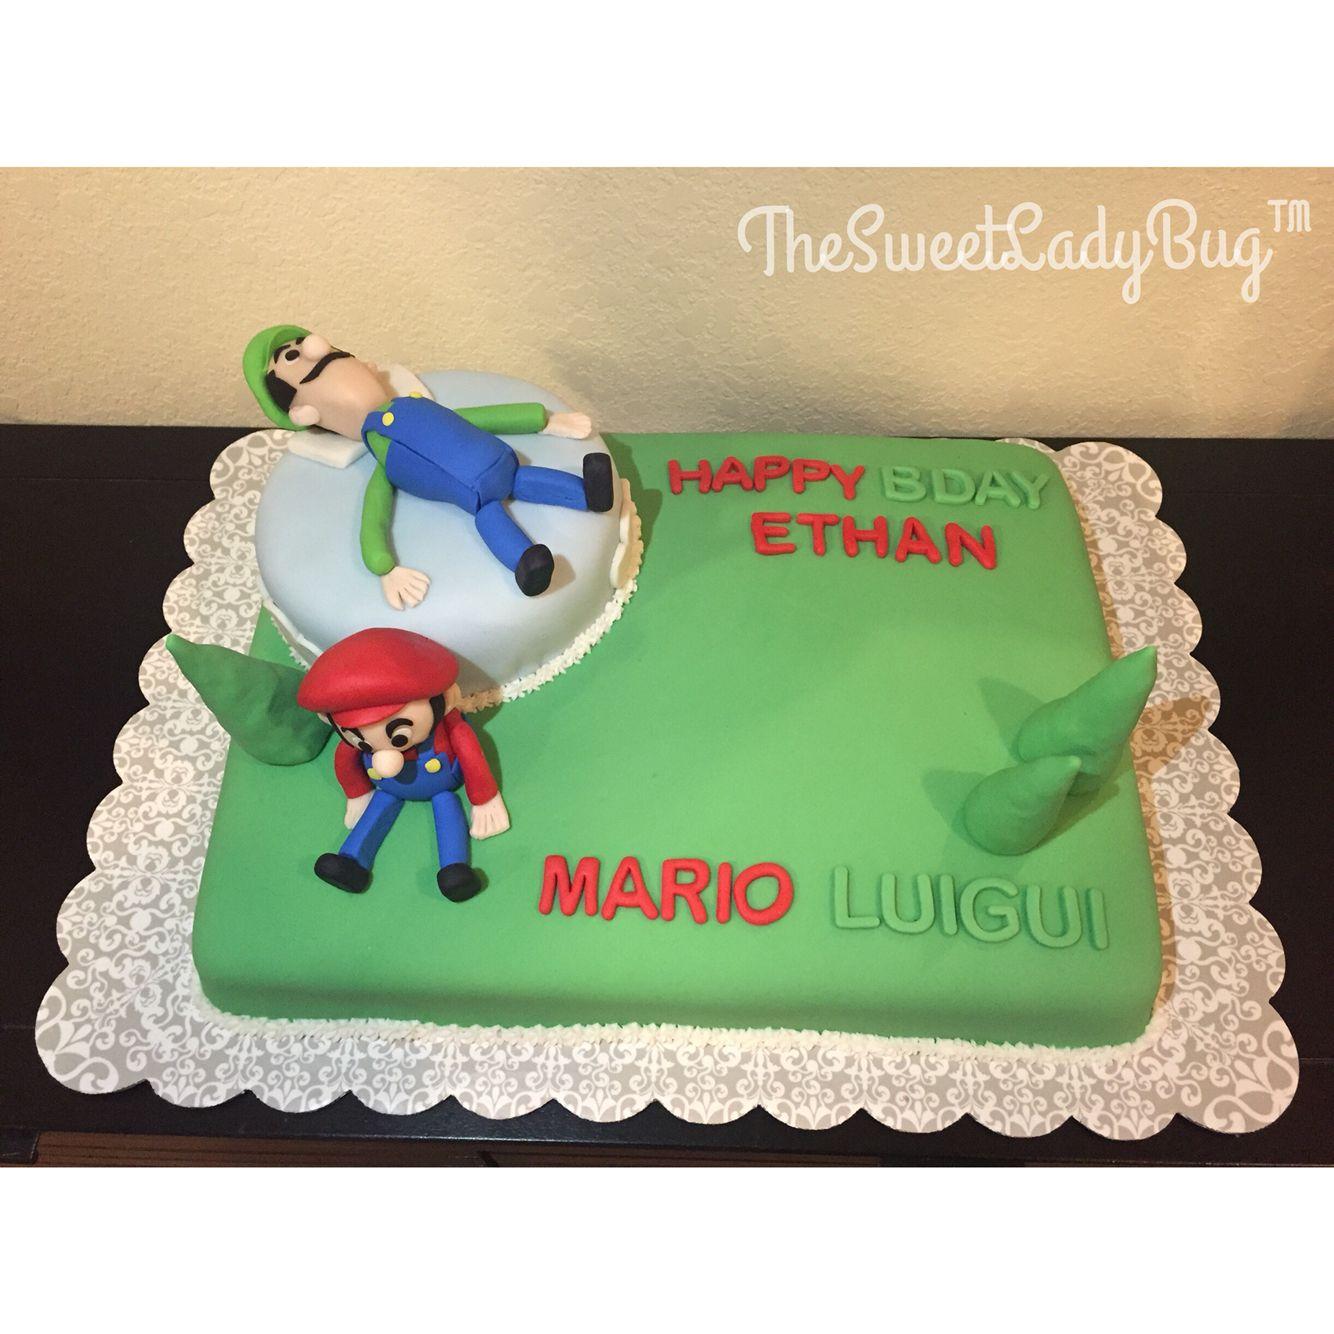 Mario and Luigui Cake